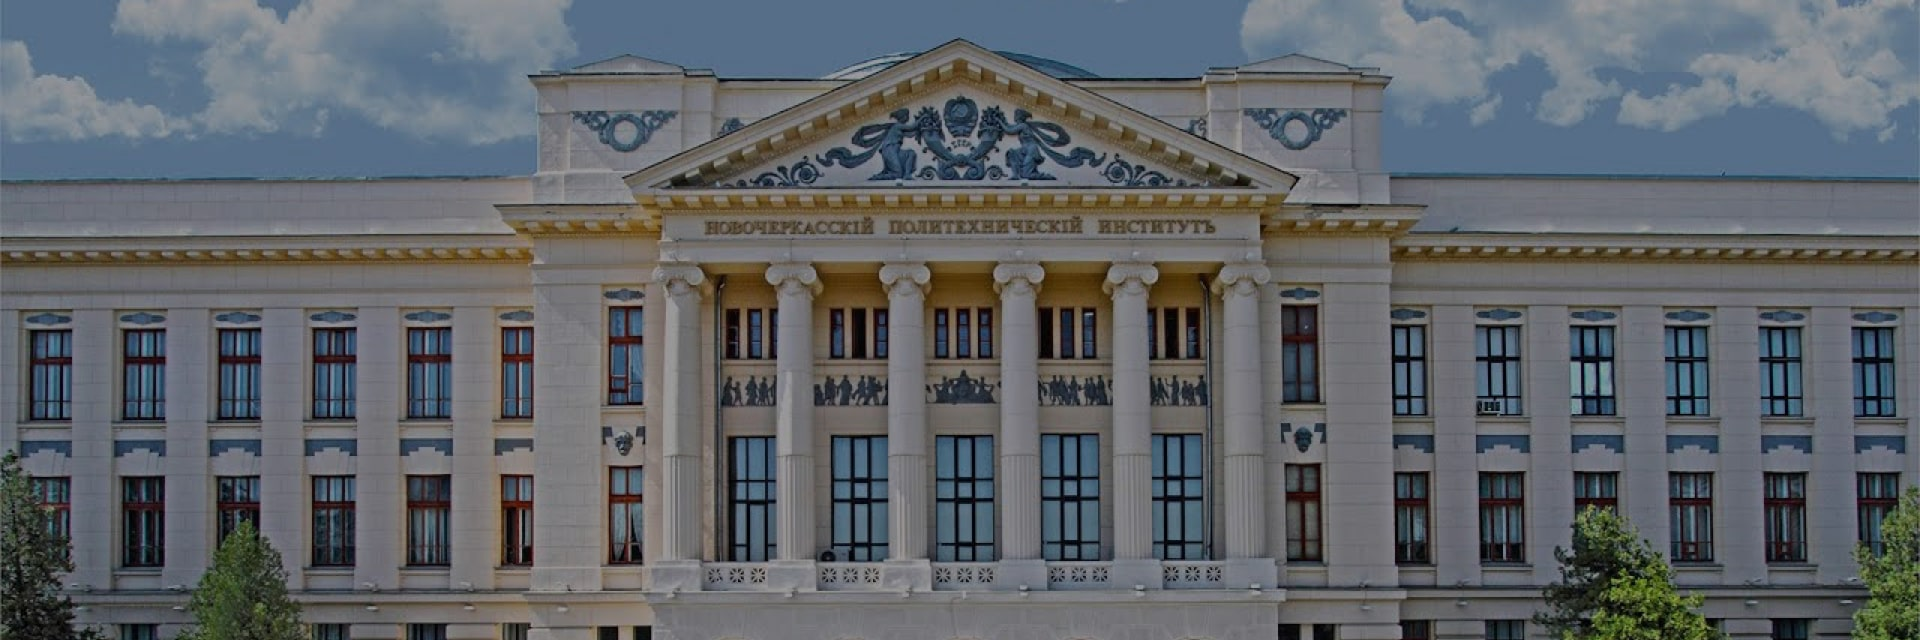 Platov South-Russian State Polytechnic University